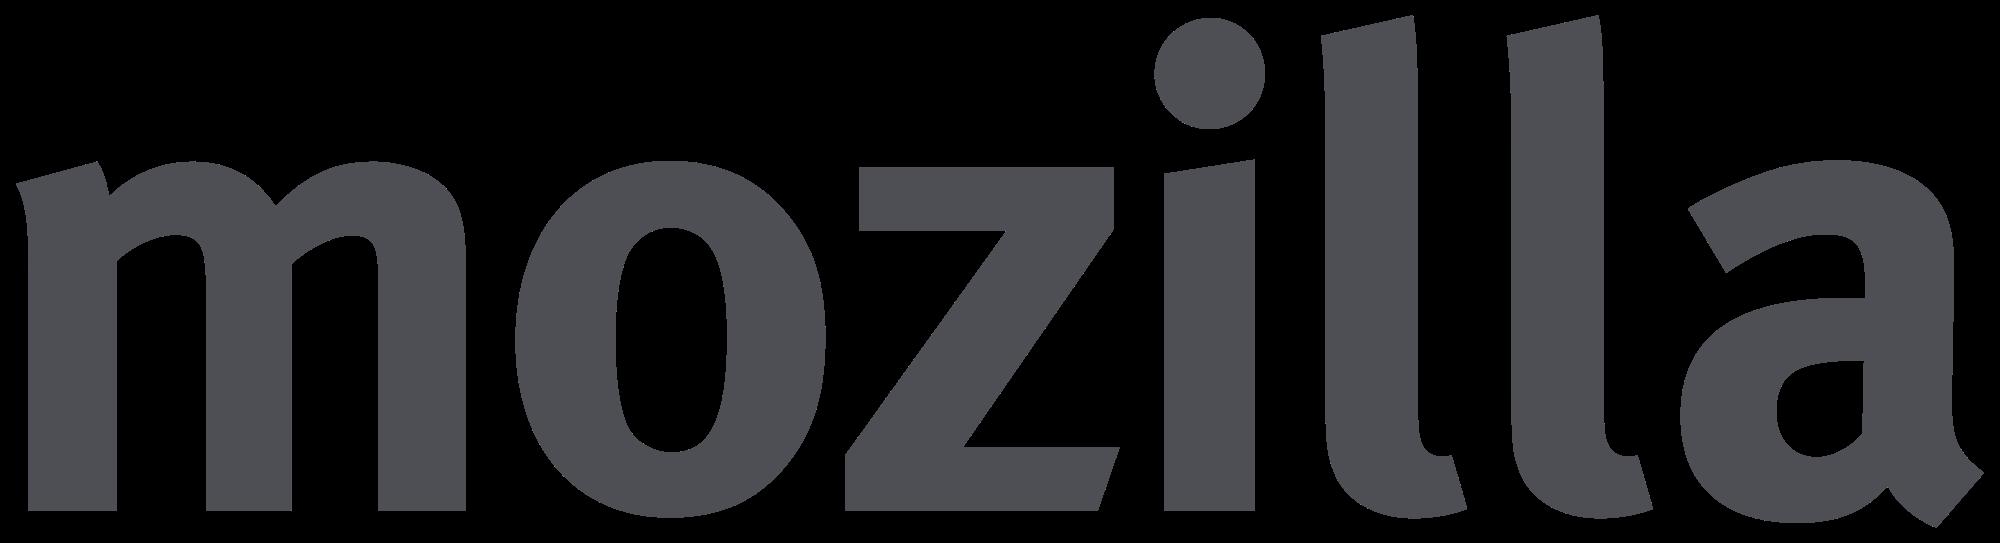 mozilla-foundation-201x-logo.png